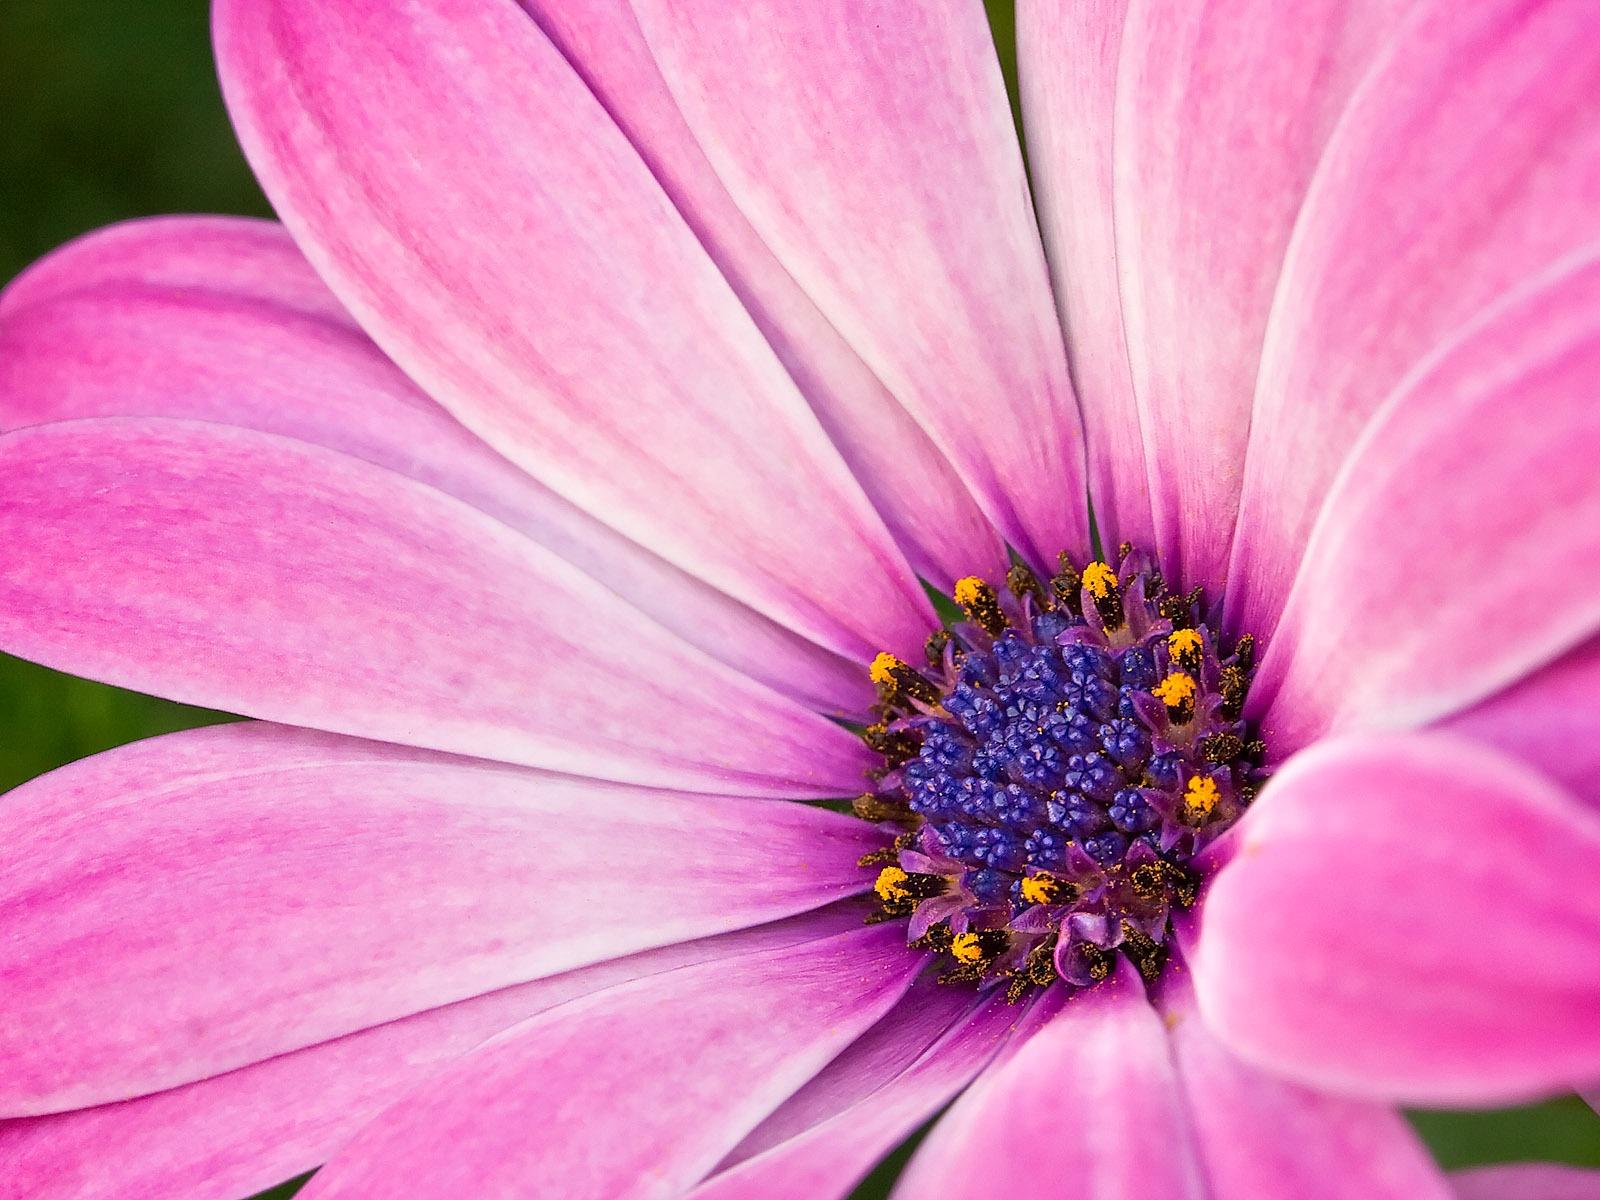 http://2.bp.blogspot.com/-ddADs2NOoc8/T_WoUm5clbI/AAAAAAAACXU/UlPDbfs-hJw/s1600/pink+flower+wallpaper+3.jpg